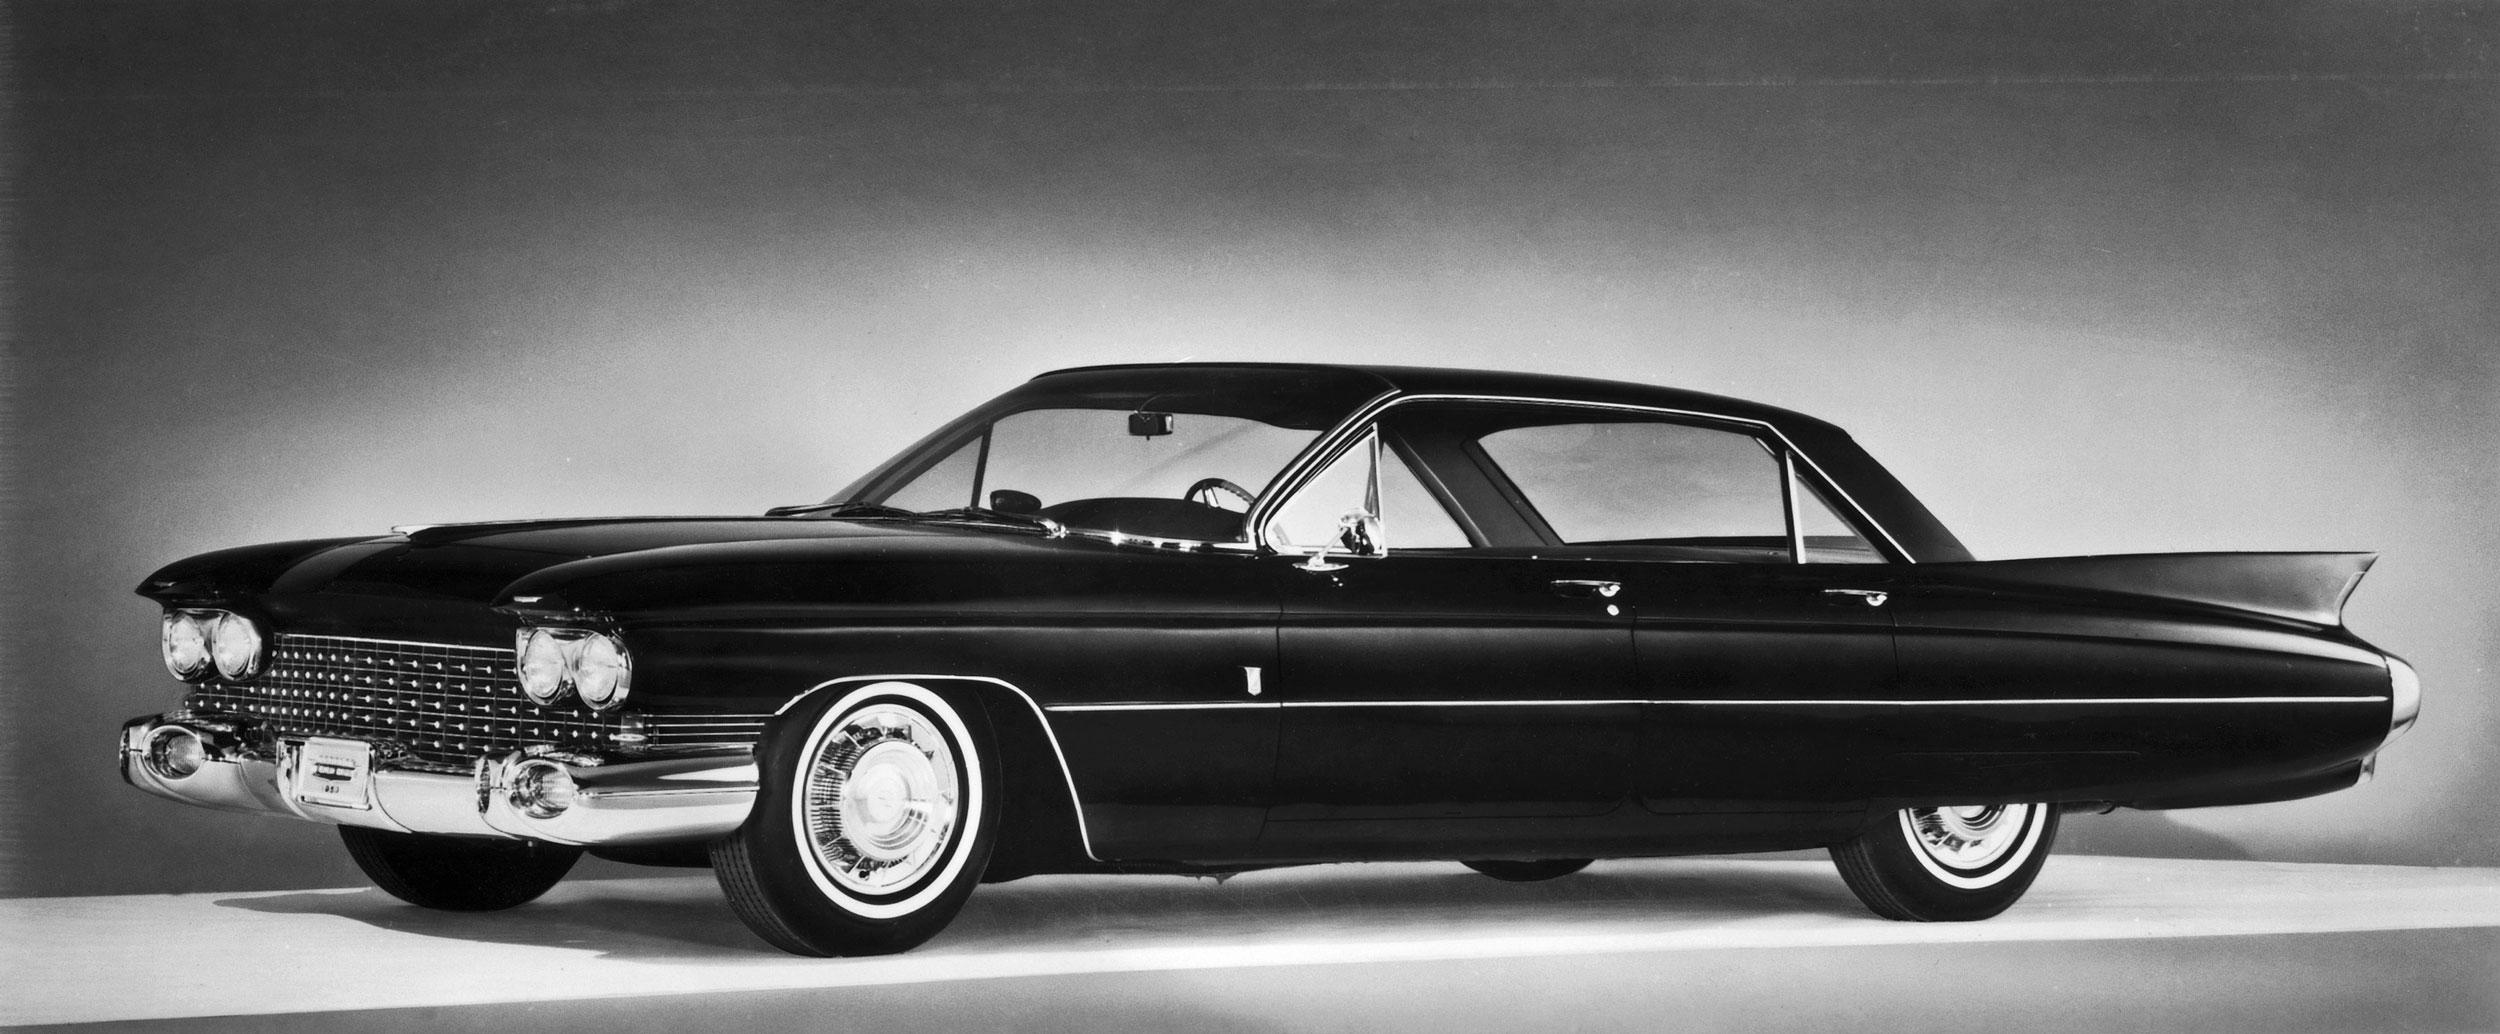 1959 Cadillac Edlorado Brougham, one of 99 built by Pininfarina.